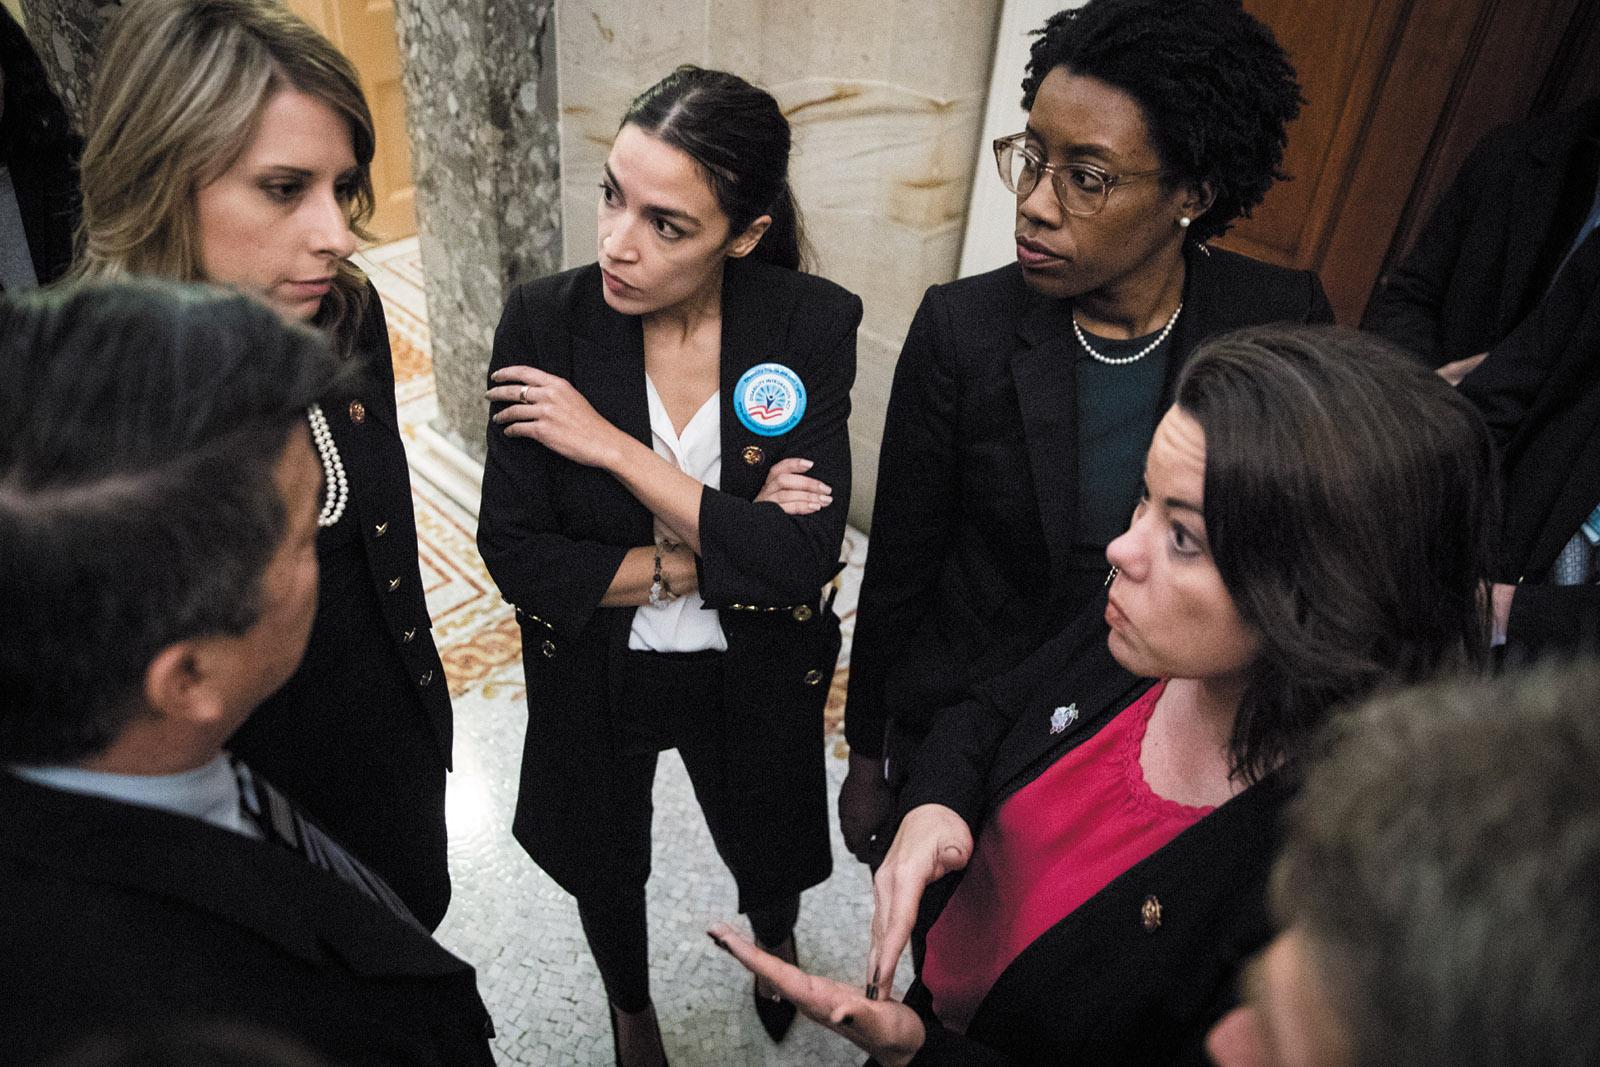 Democratic representatives Katie Hill, Alexandria Ocasio-Cortez, Lauren Underwood, and Angie Craig, Capitol Hill, January 2019